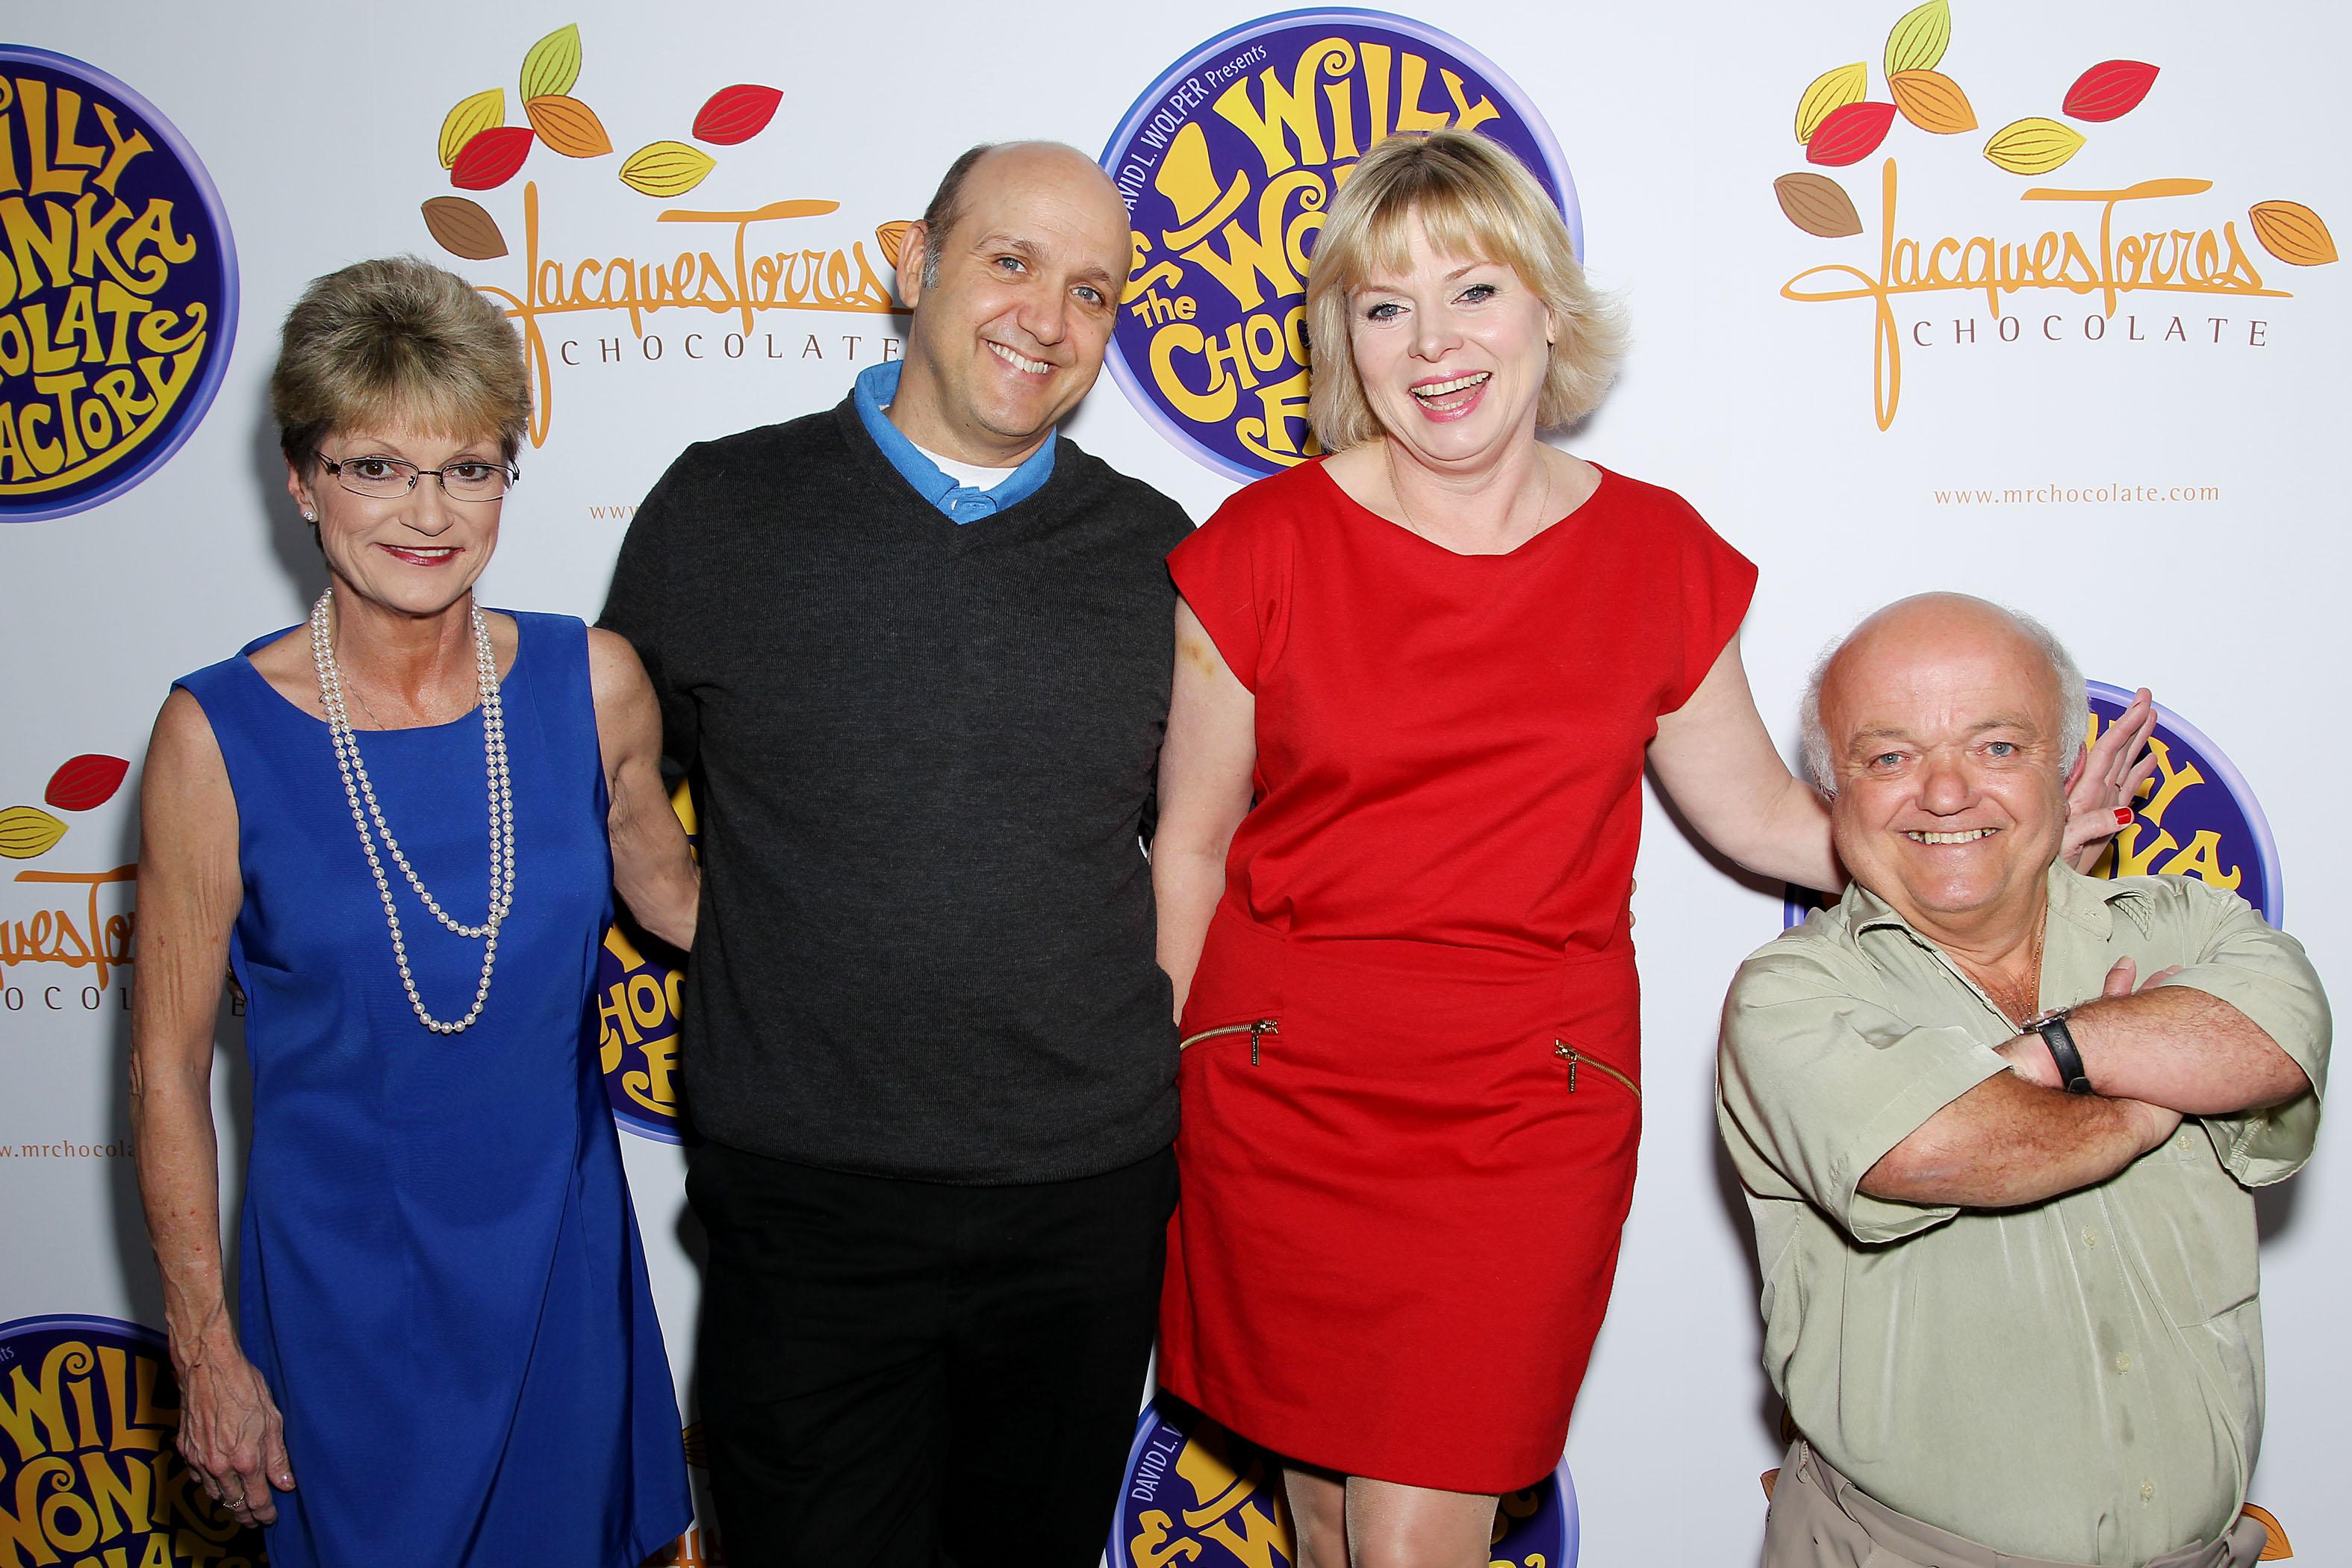 Willy Wonka's 'Violet Beauregarde' Remembers Gene Wilder, Who Inspired 'Pure Imagination'